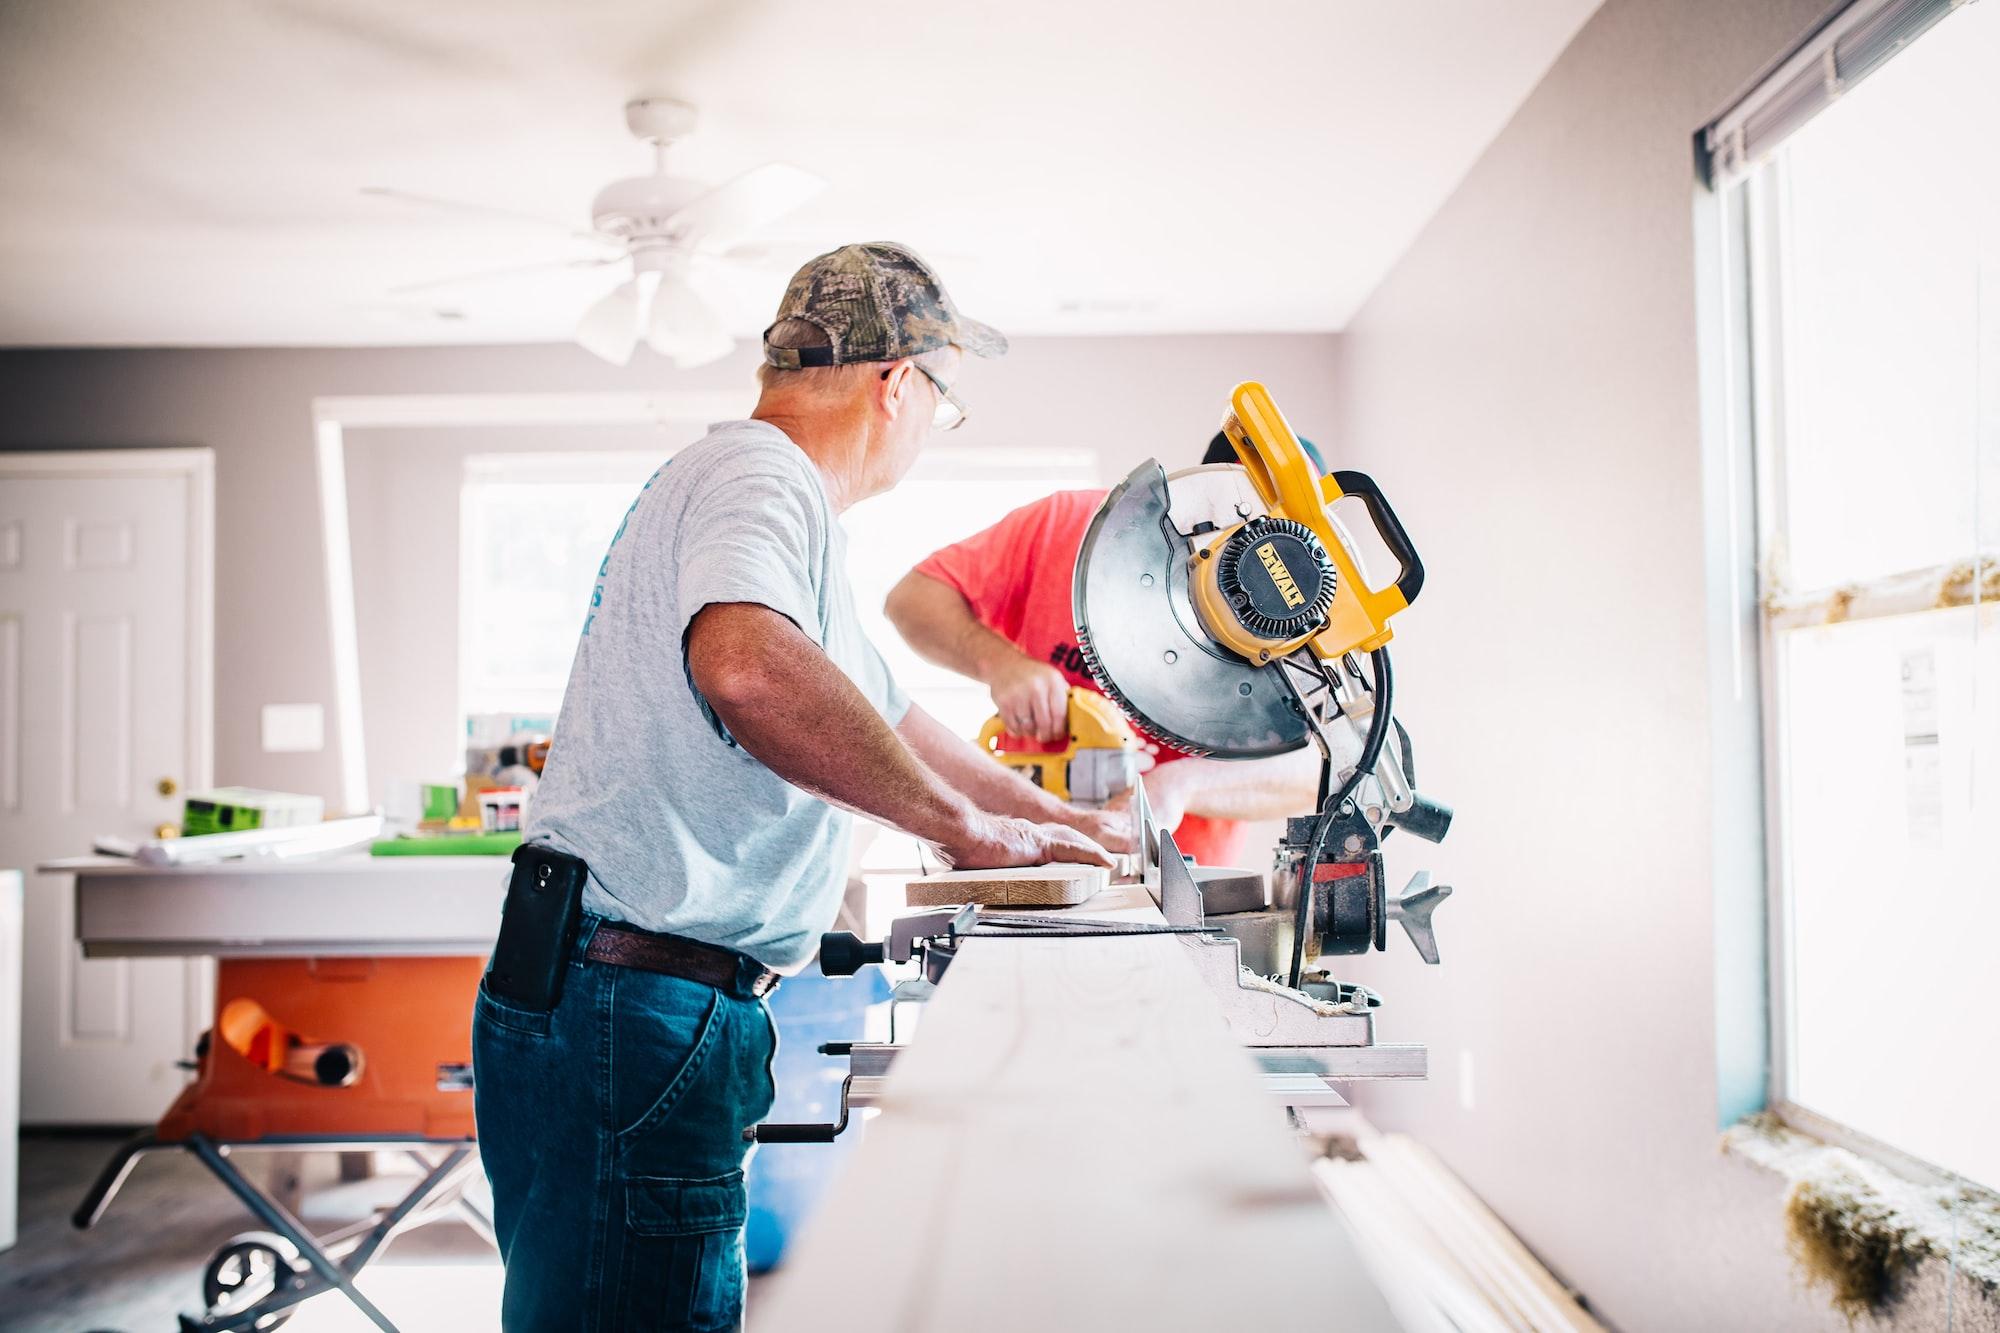 5 Best On-Demand Handyman Apps of 2021